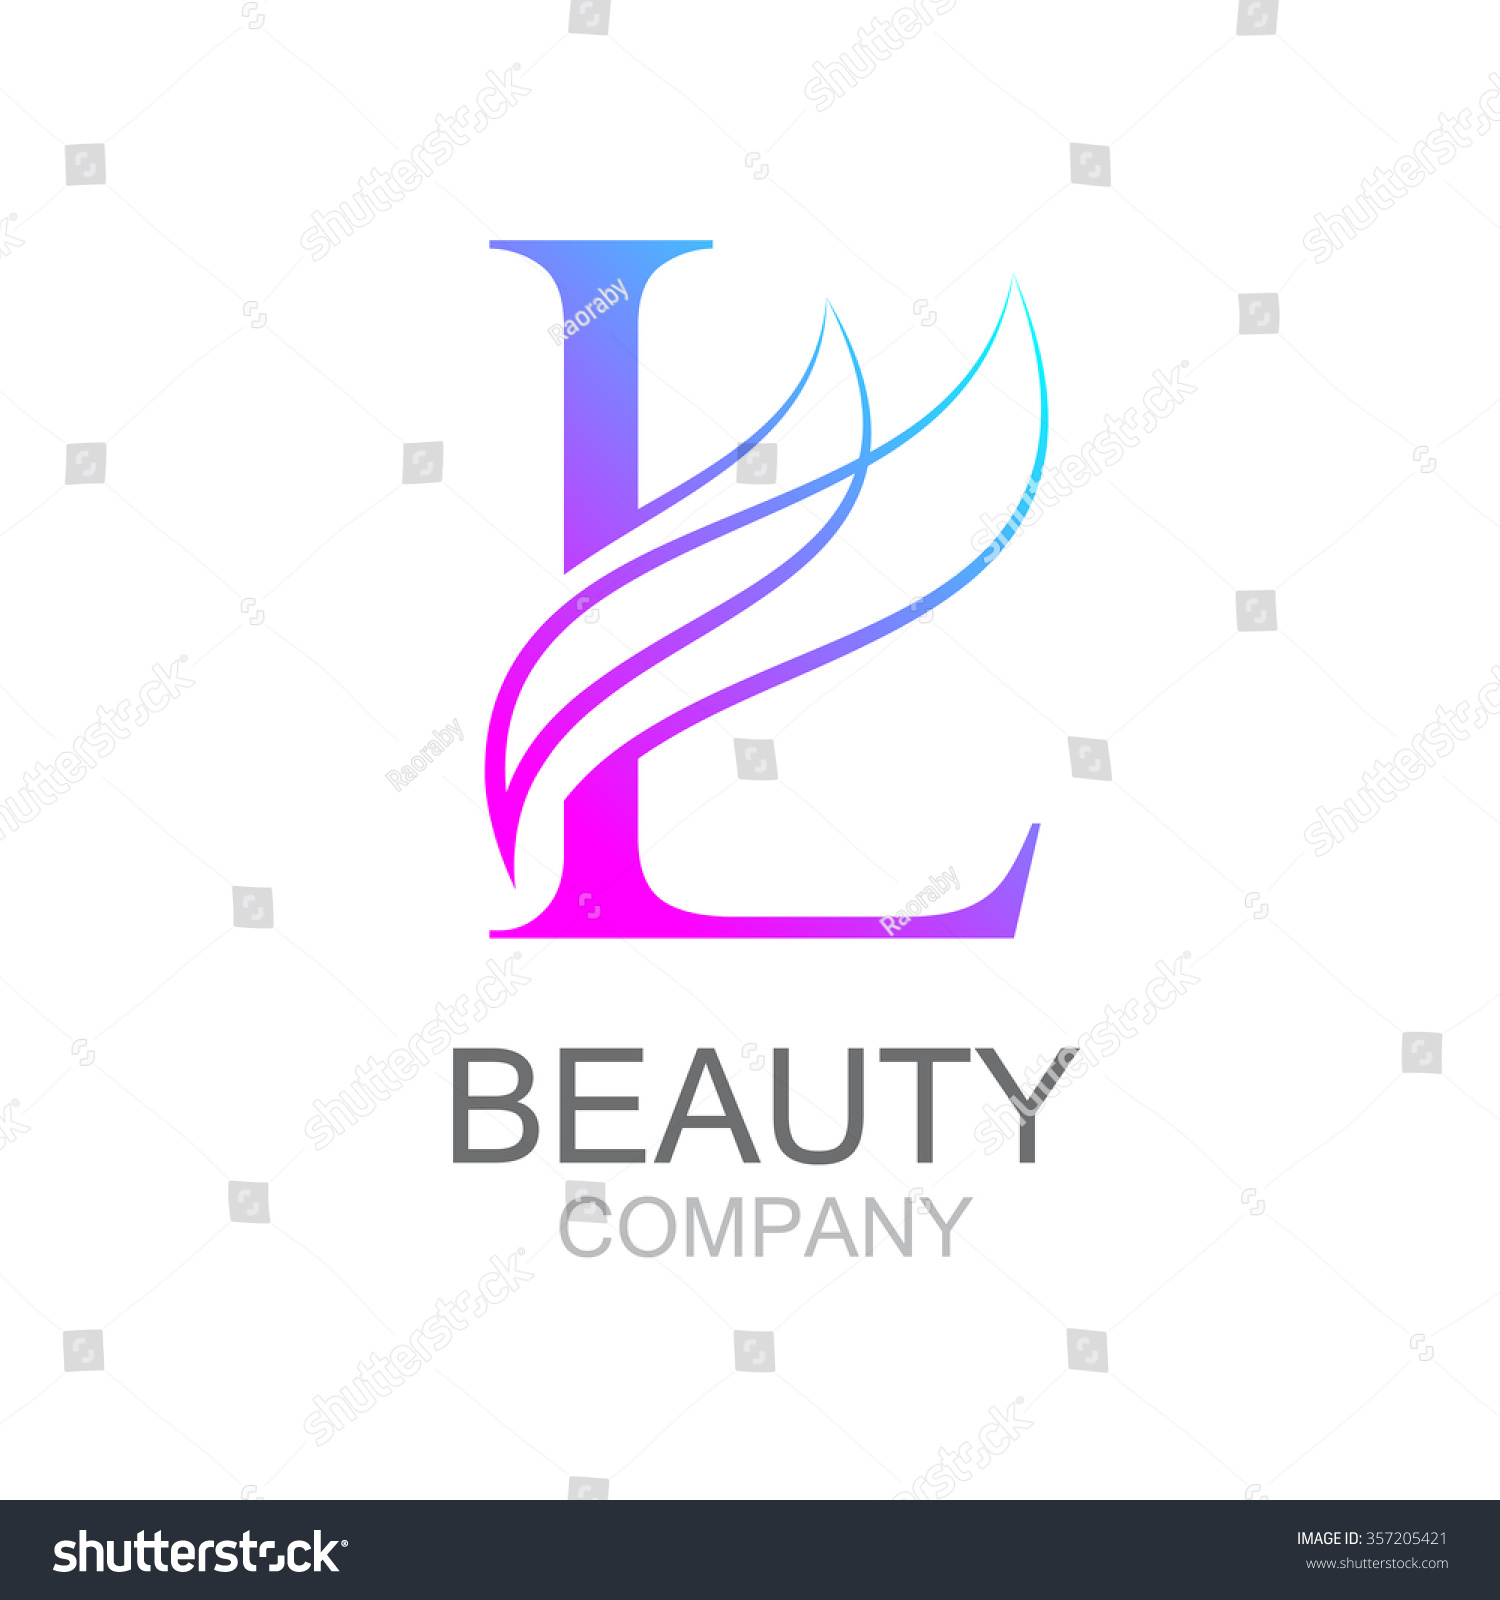 Logo Design Masterclass Learn Logo Design  Udemy